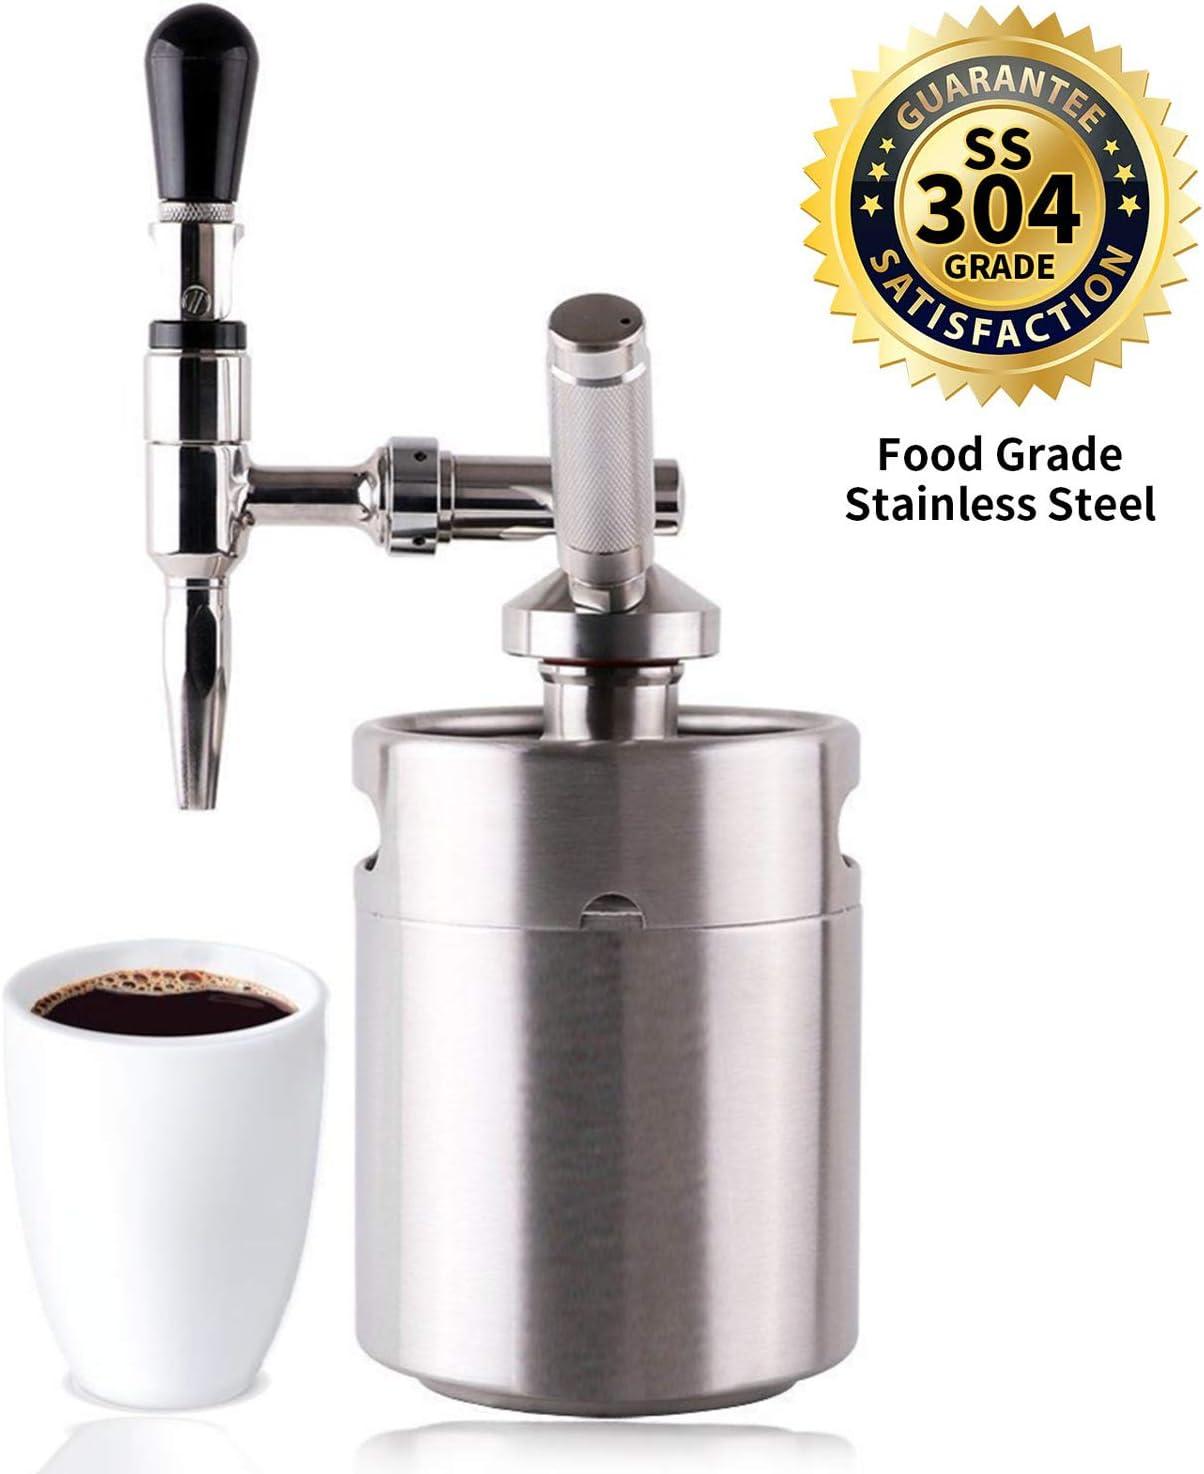 Coffee Maker Home Keg Kit System Nitro Cold Brew Coffee Maker 64 Oz Stainless Steel Homebrew Nitrogen Infuser 2 L Keg Personal Coffee Maker Machine Kit System (Silver)